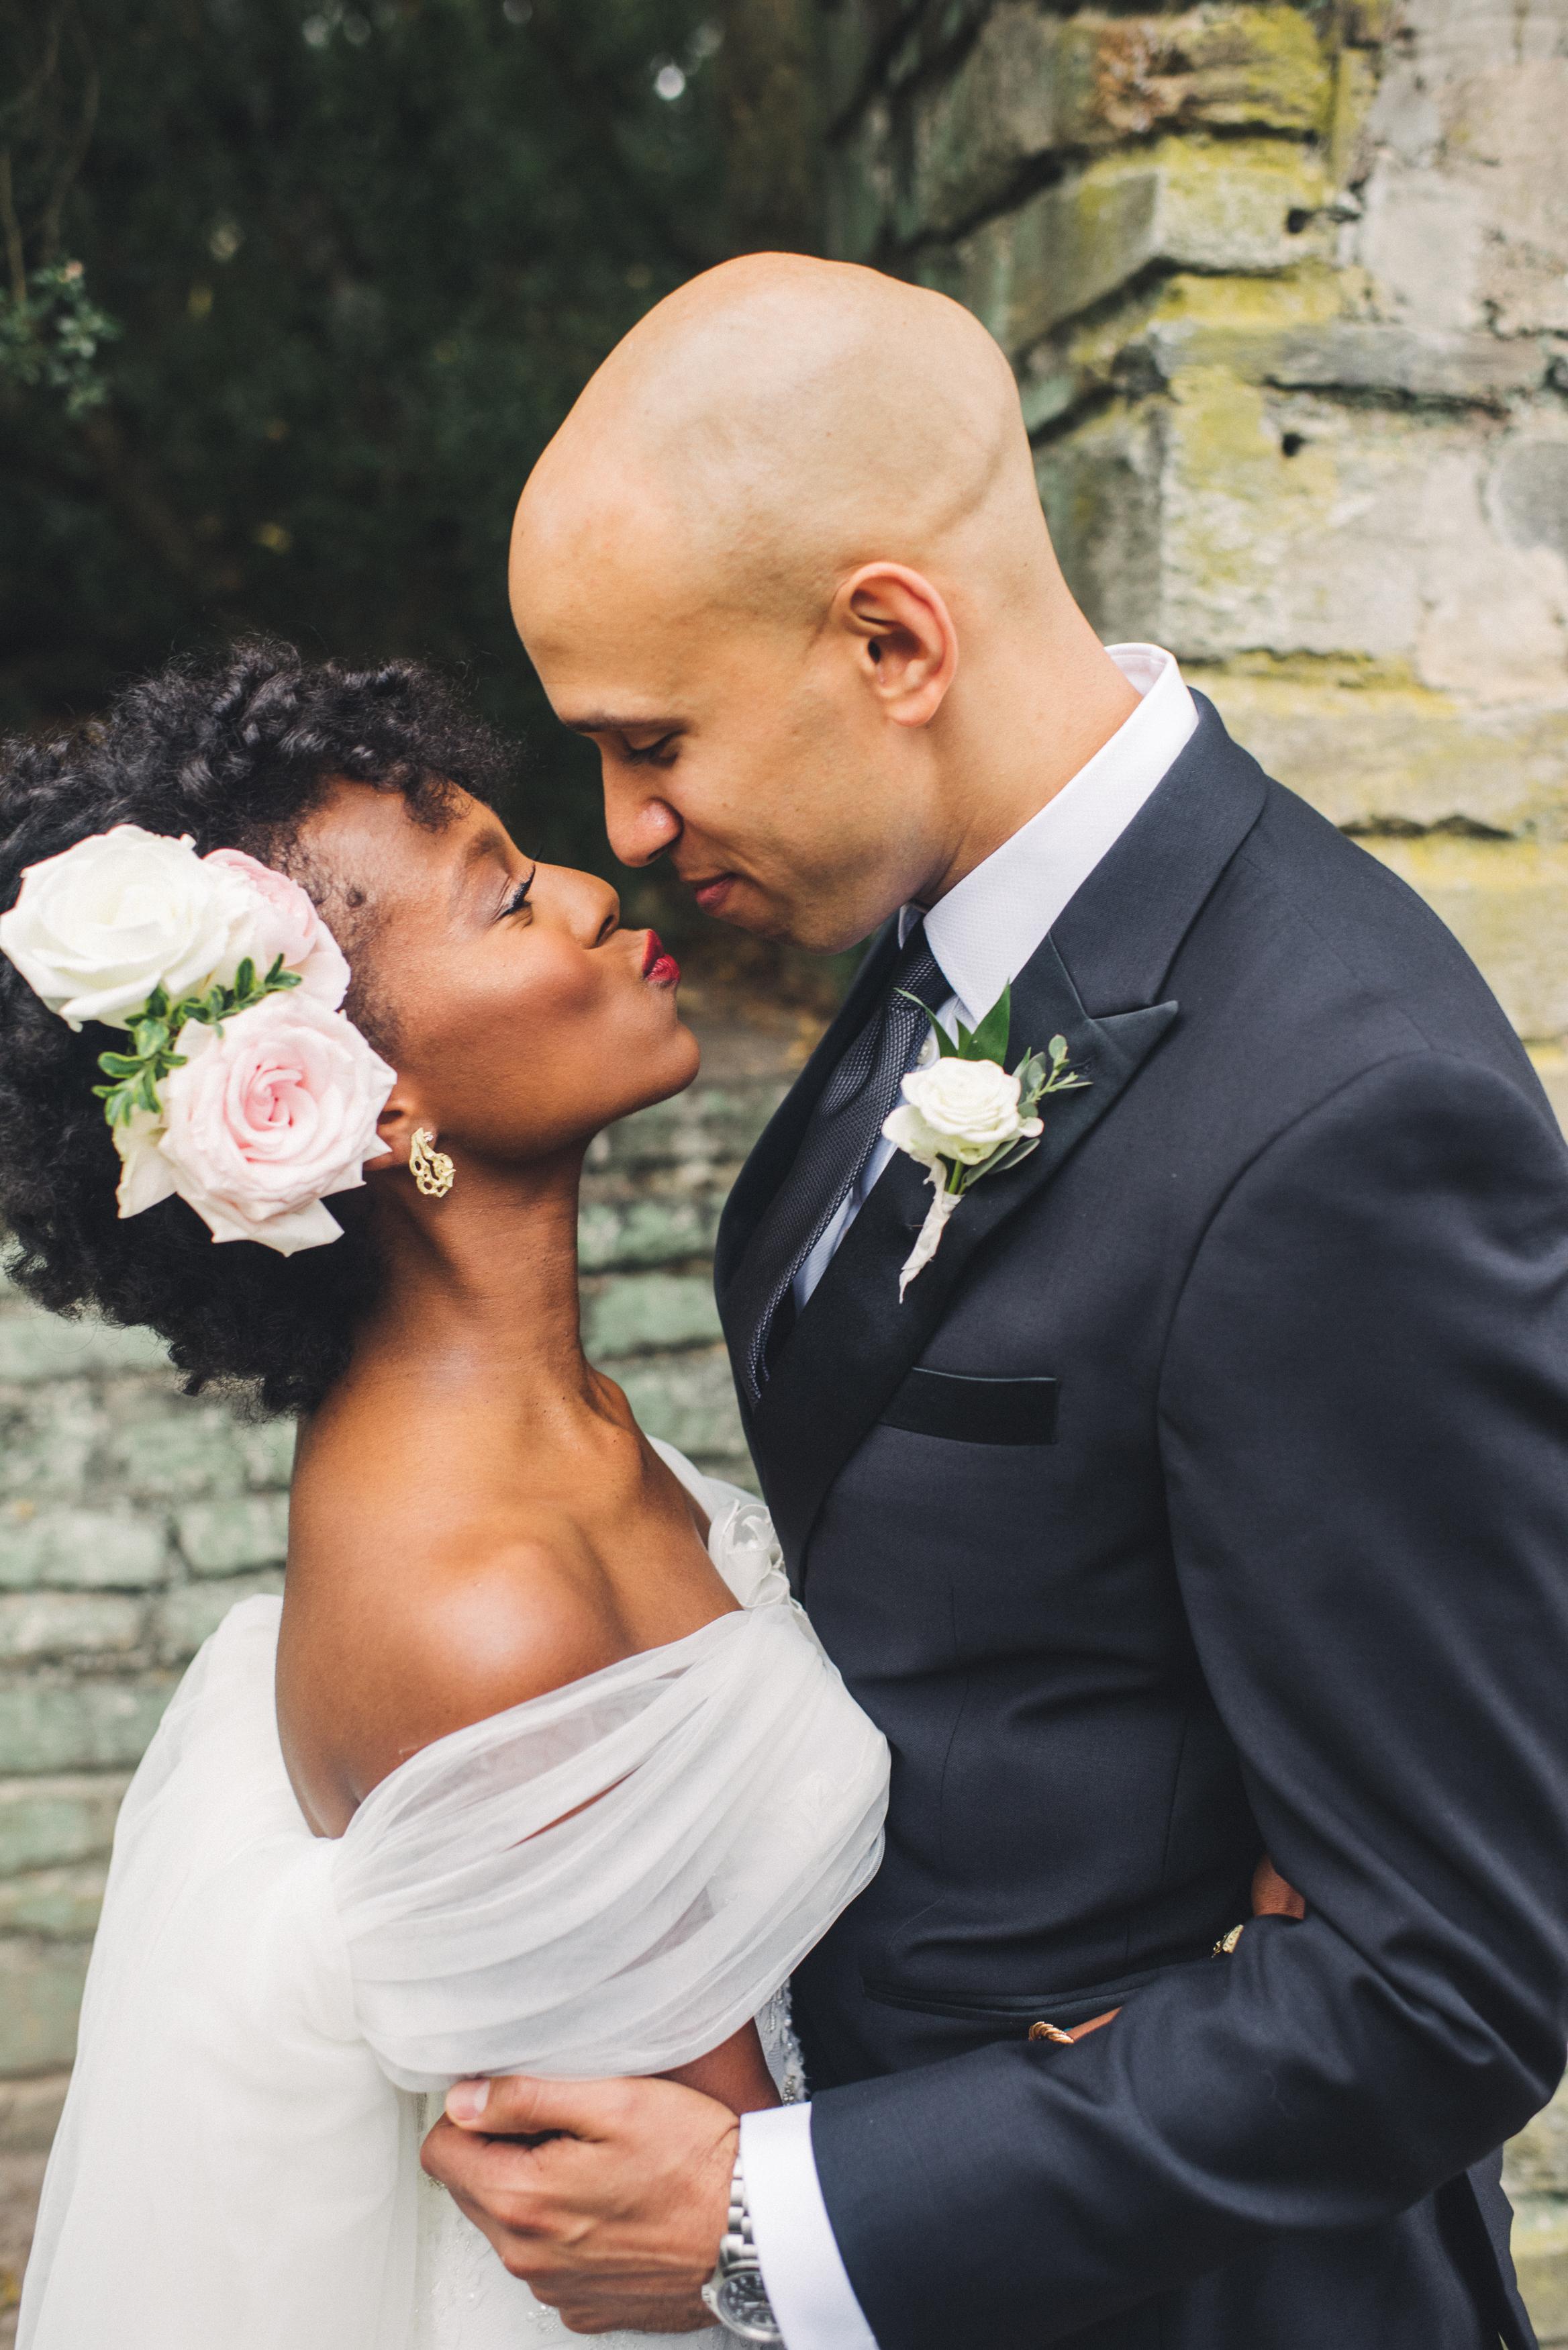 SADATU & KAREEM - GLENVIEW MANSION WEDDING - TWOTWENTY by CHI-CHI AGBIM-97.jpg